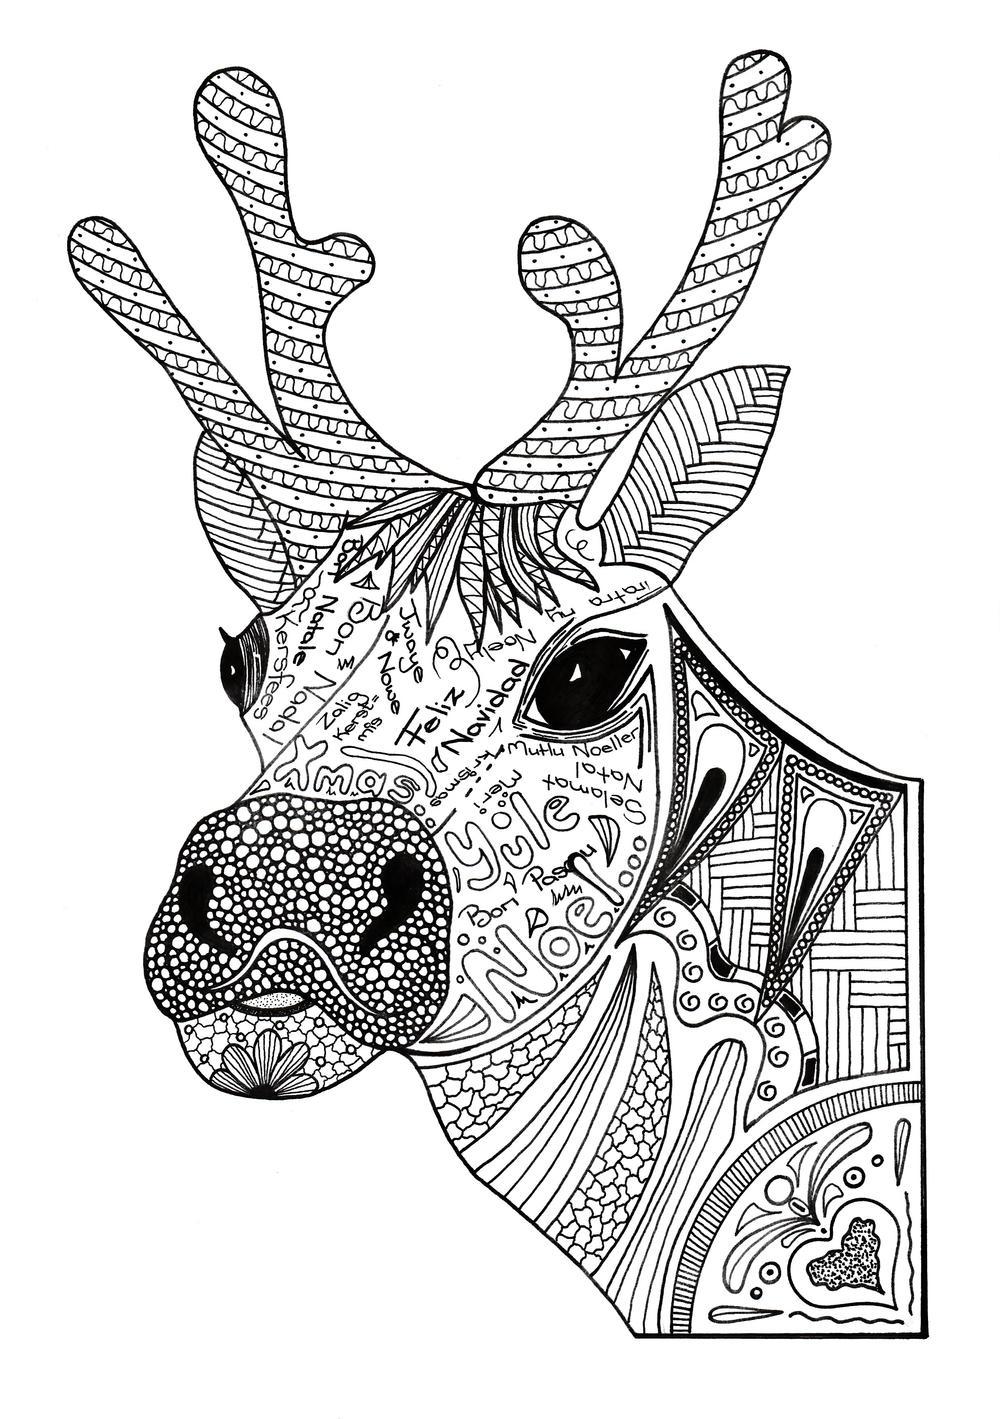 Adorable Reindeer Coloring Sheet - Worksheet & Coloring Pages